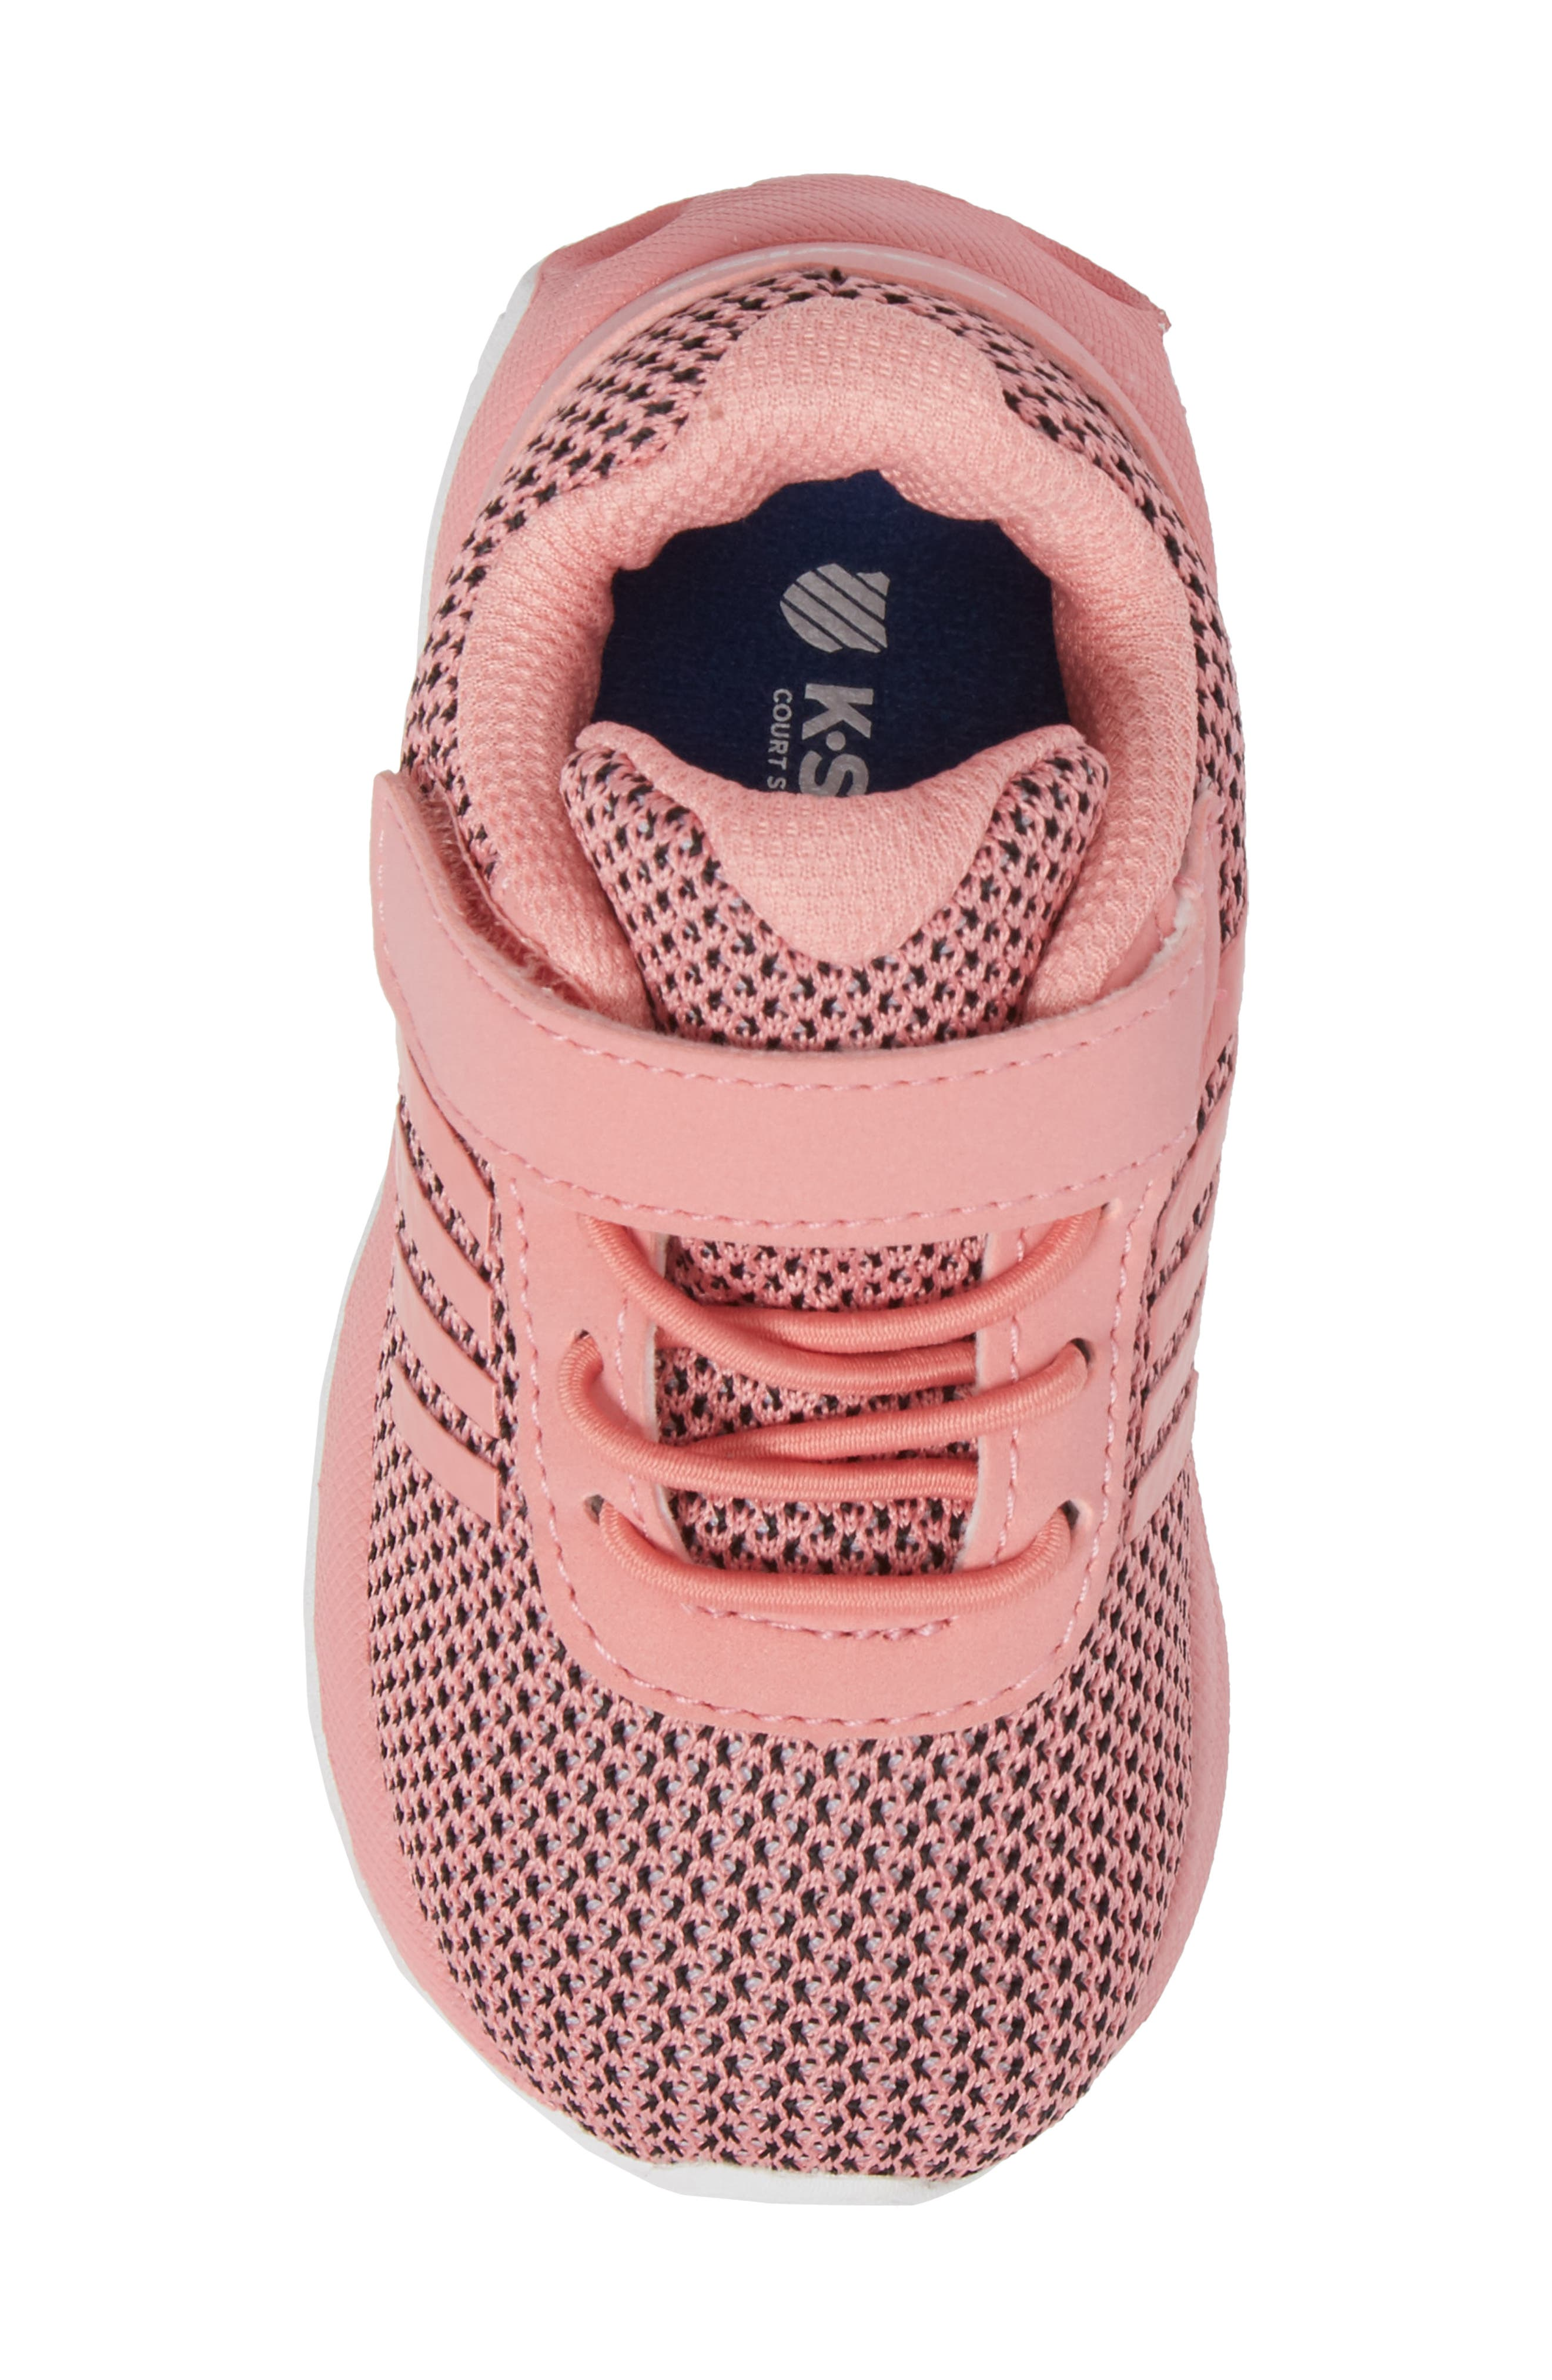 Tubes Infinity Sneaker,                             Alternate thumbnail 5, color,                             Flamingo Pink/ White